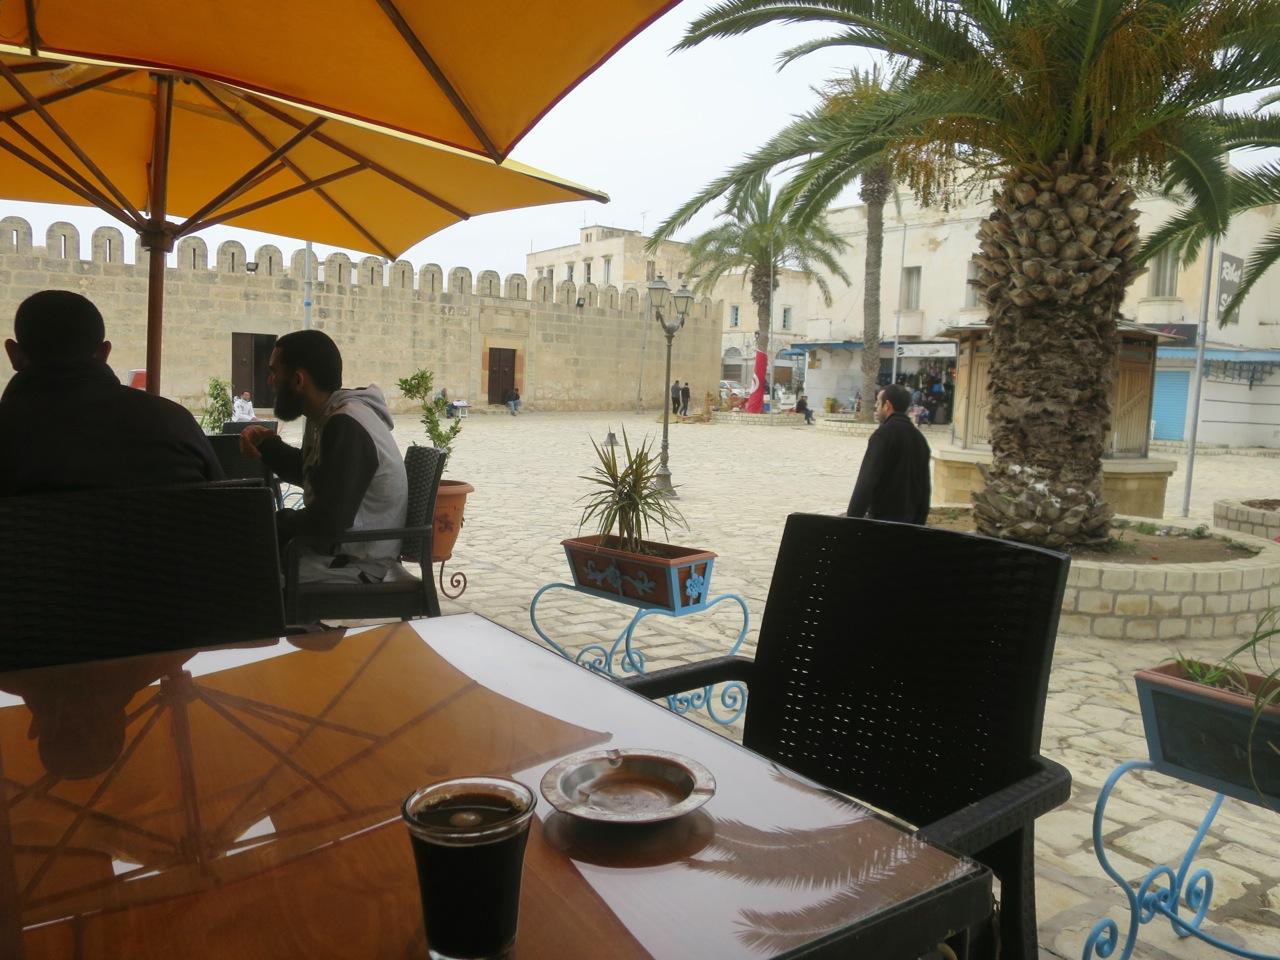 Cafe no mundo arabe